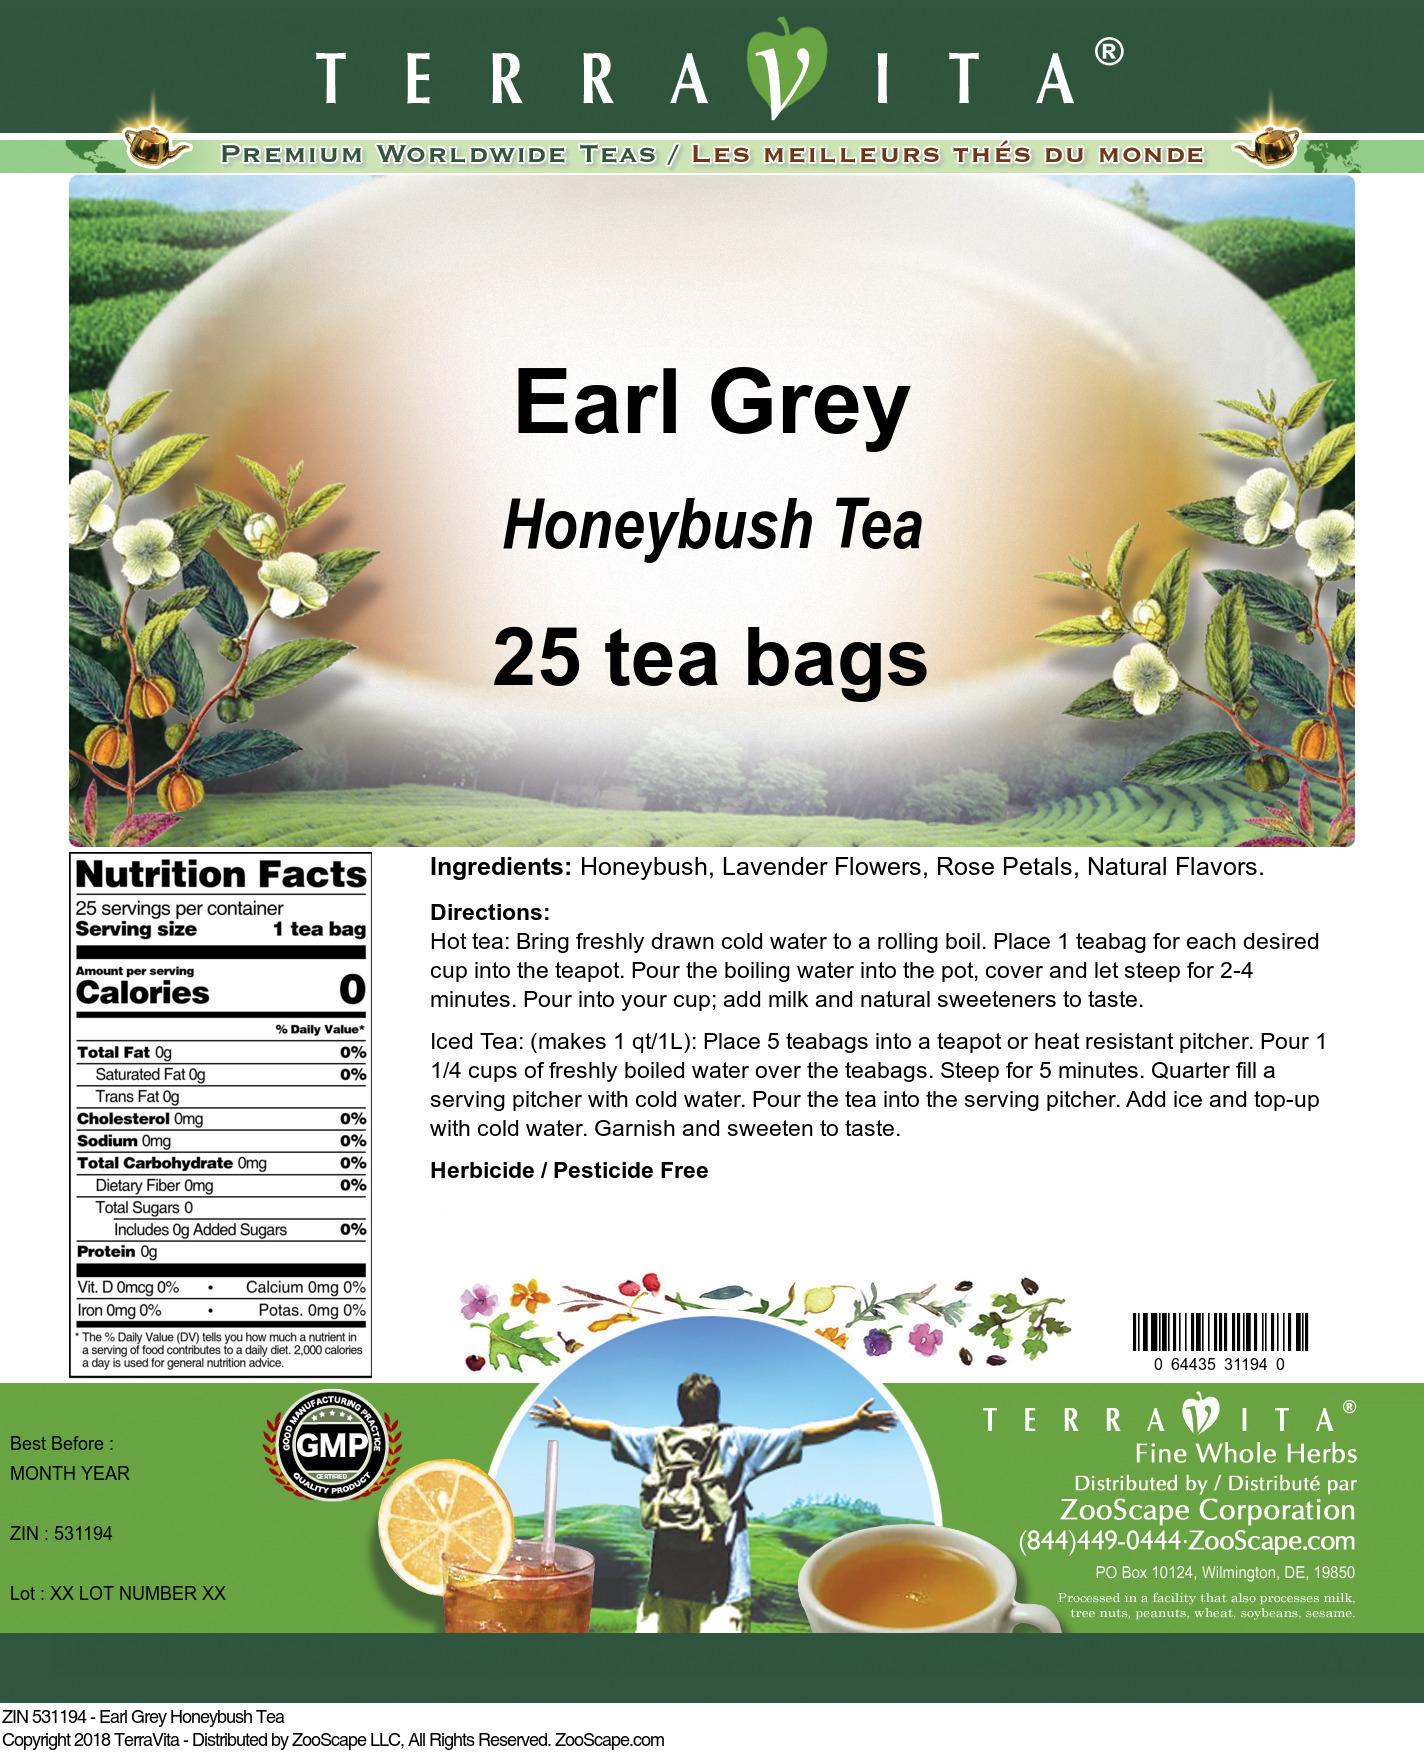 Earl Grey Honeybush Tea